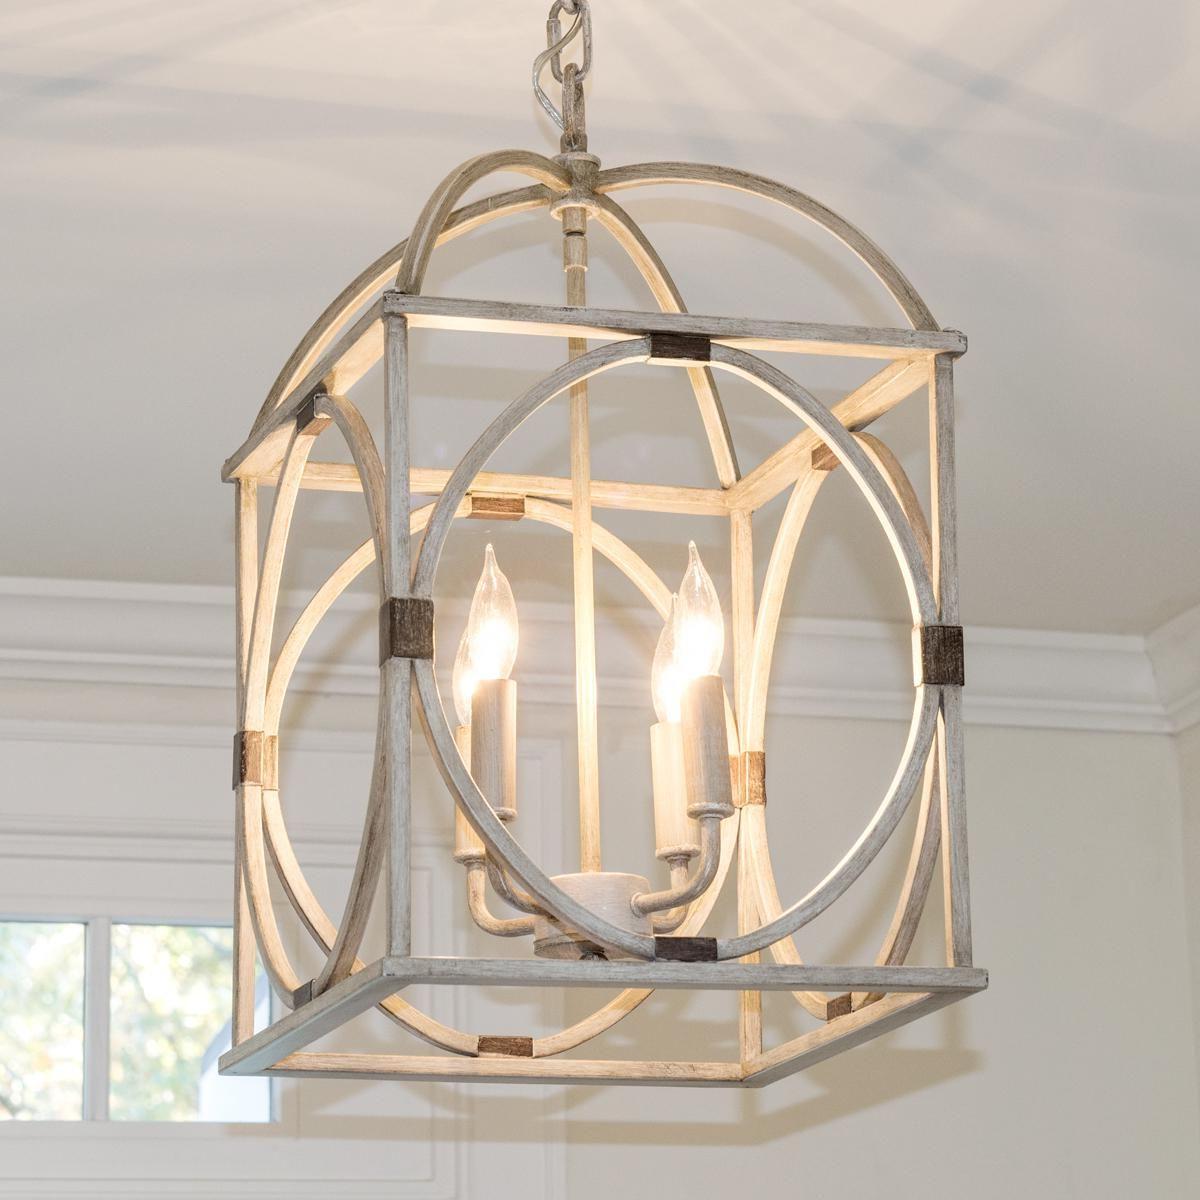 Nisbet 4 Light Lantern Geometric Pendants Throughout Best And Newest Circle Lattice Hanging Lantern – 4 Light (View 20 of 25)